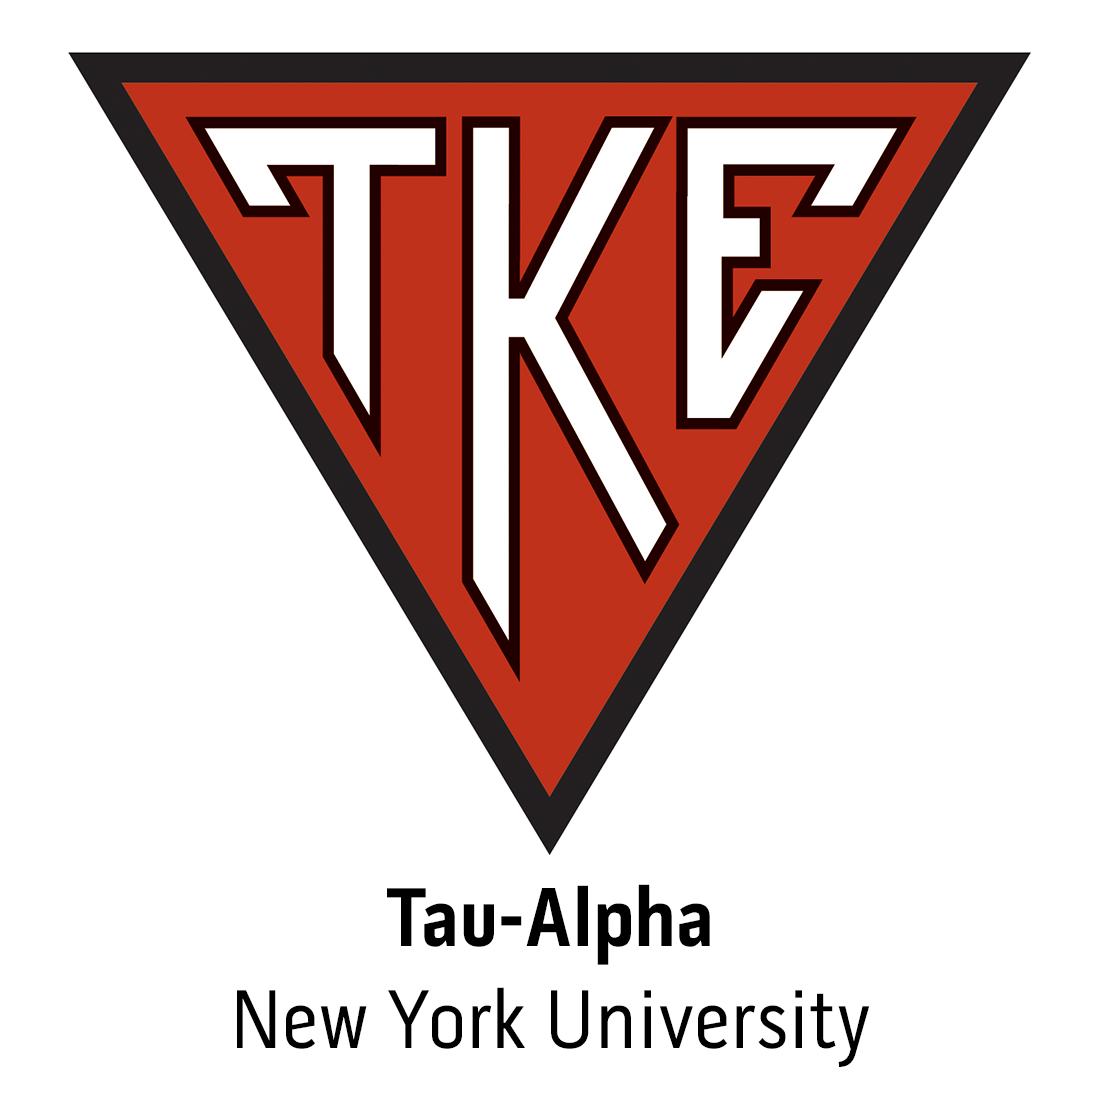 Tau-Alpha C at New York University